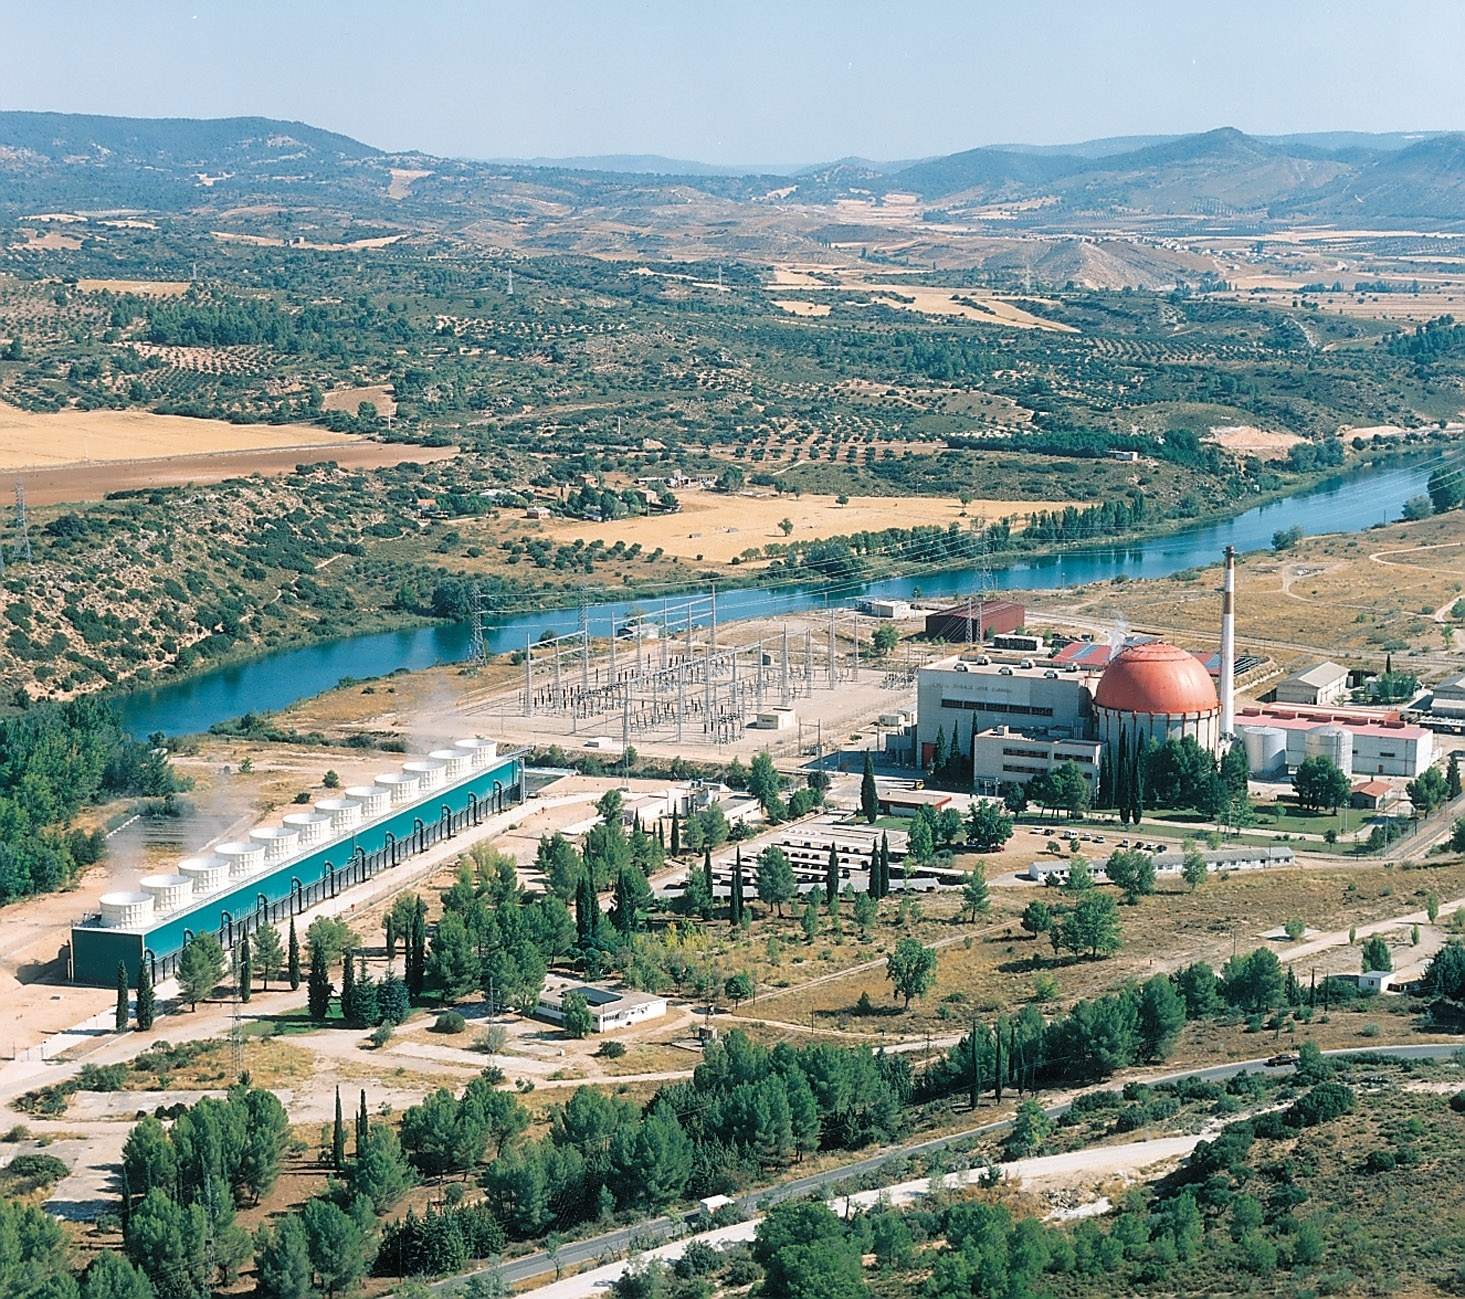 Vivir cerca de centrales nucleares no aumenta el riesgo de leucemia infantil